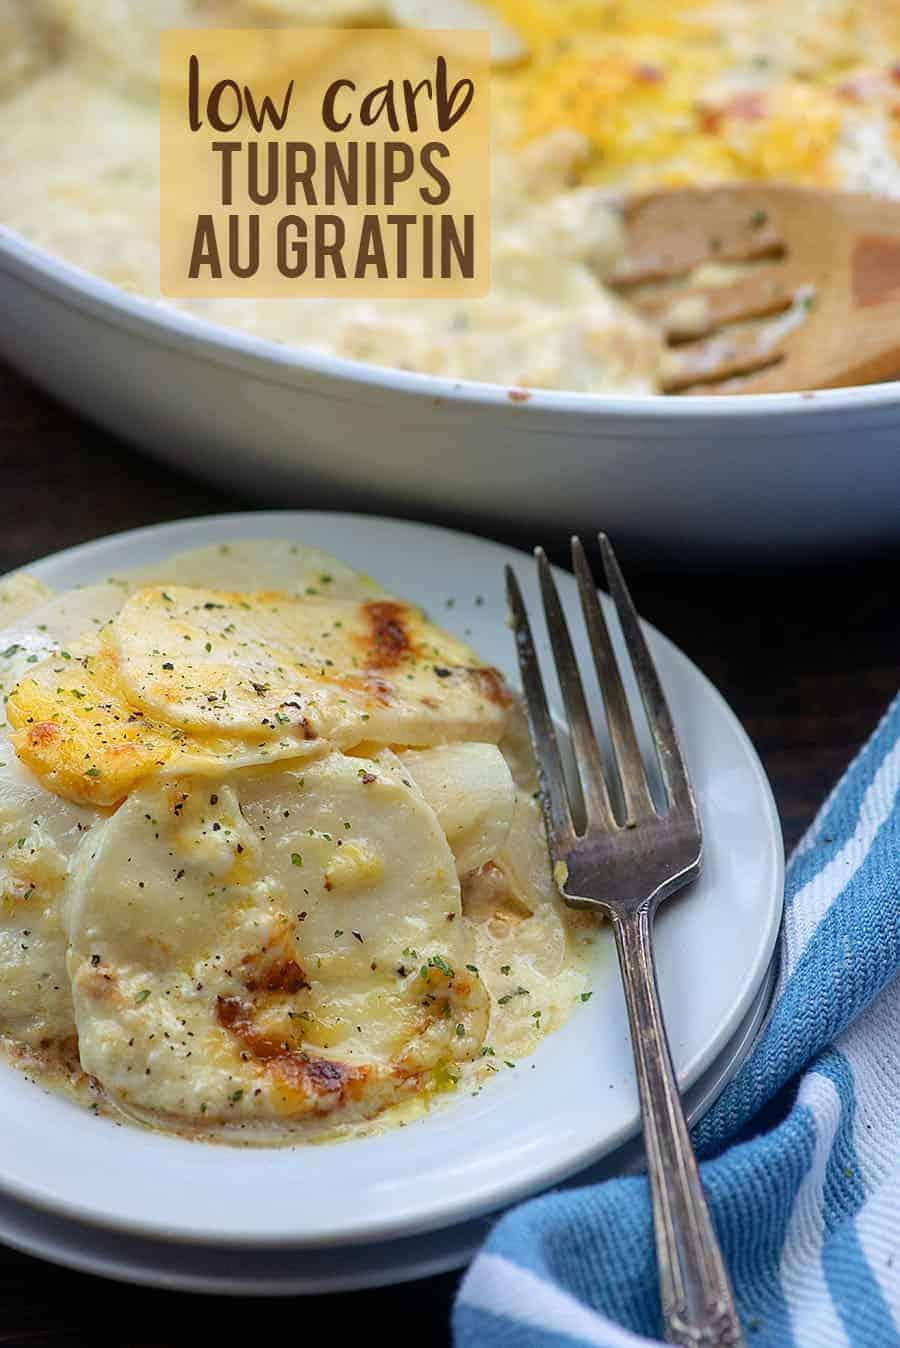 cheesy turnips recipe on white plate